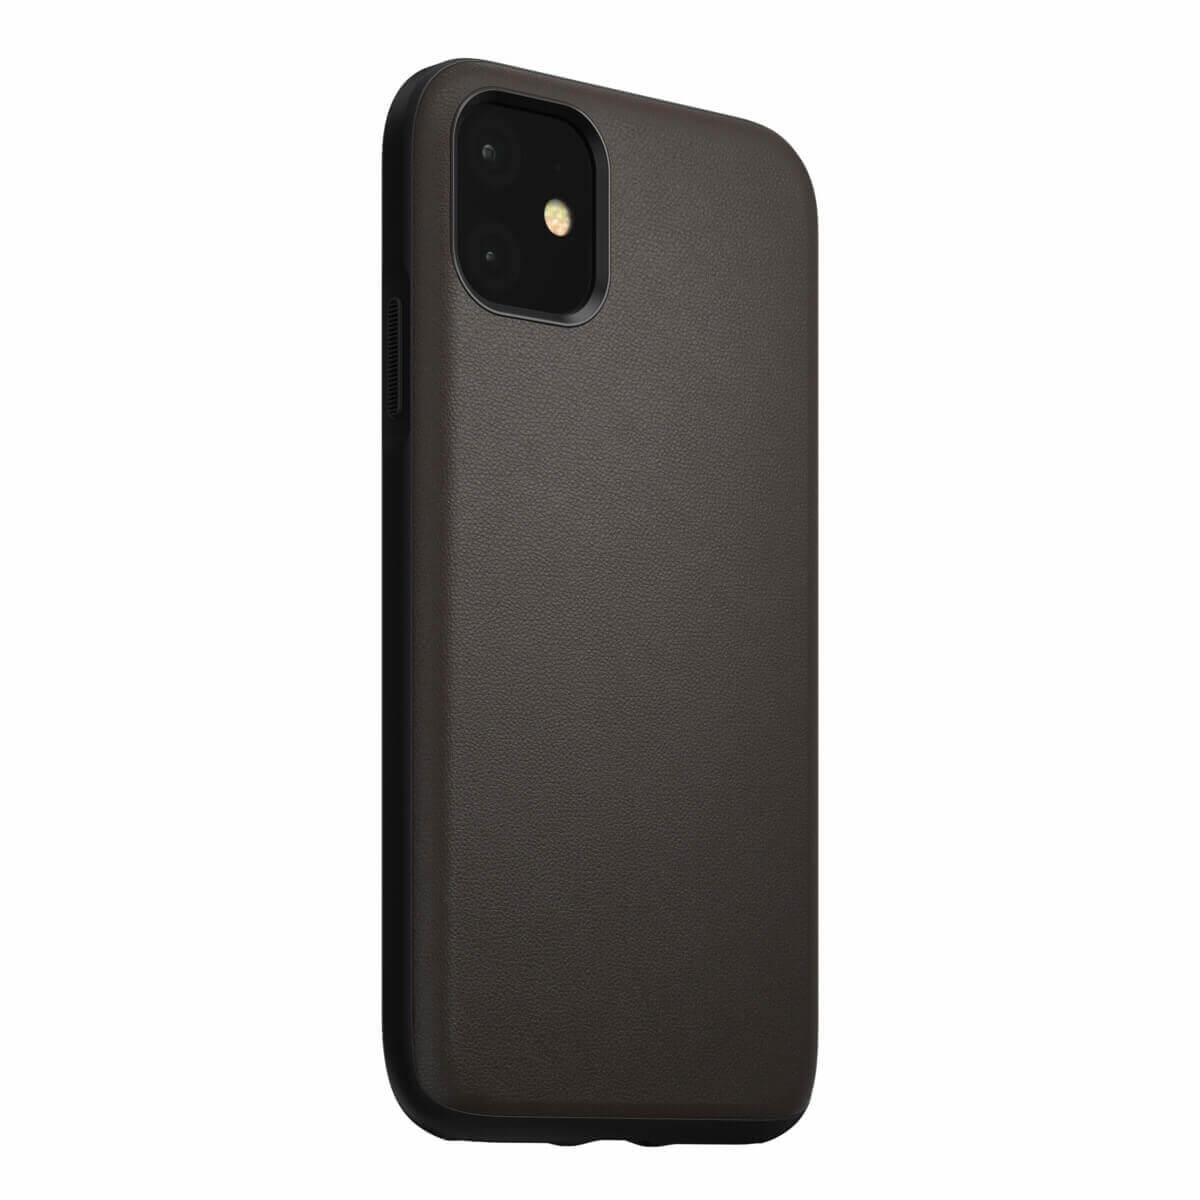 Nomad Leather Rugged Waterproof Case — кожен (естествена кожа) кейс за iPhone 11 (кафяв) - 1